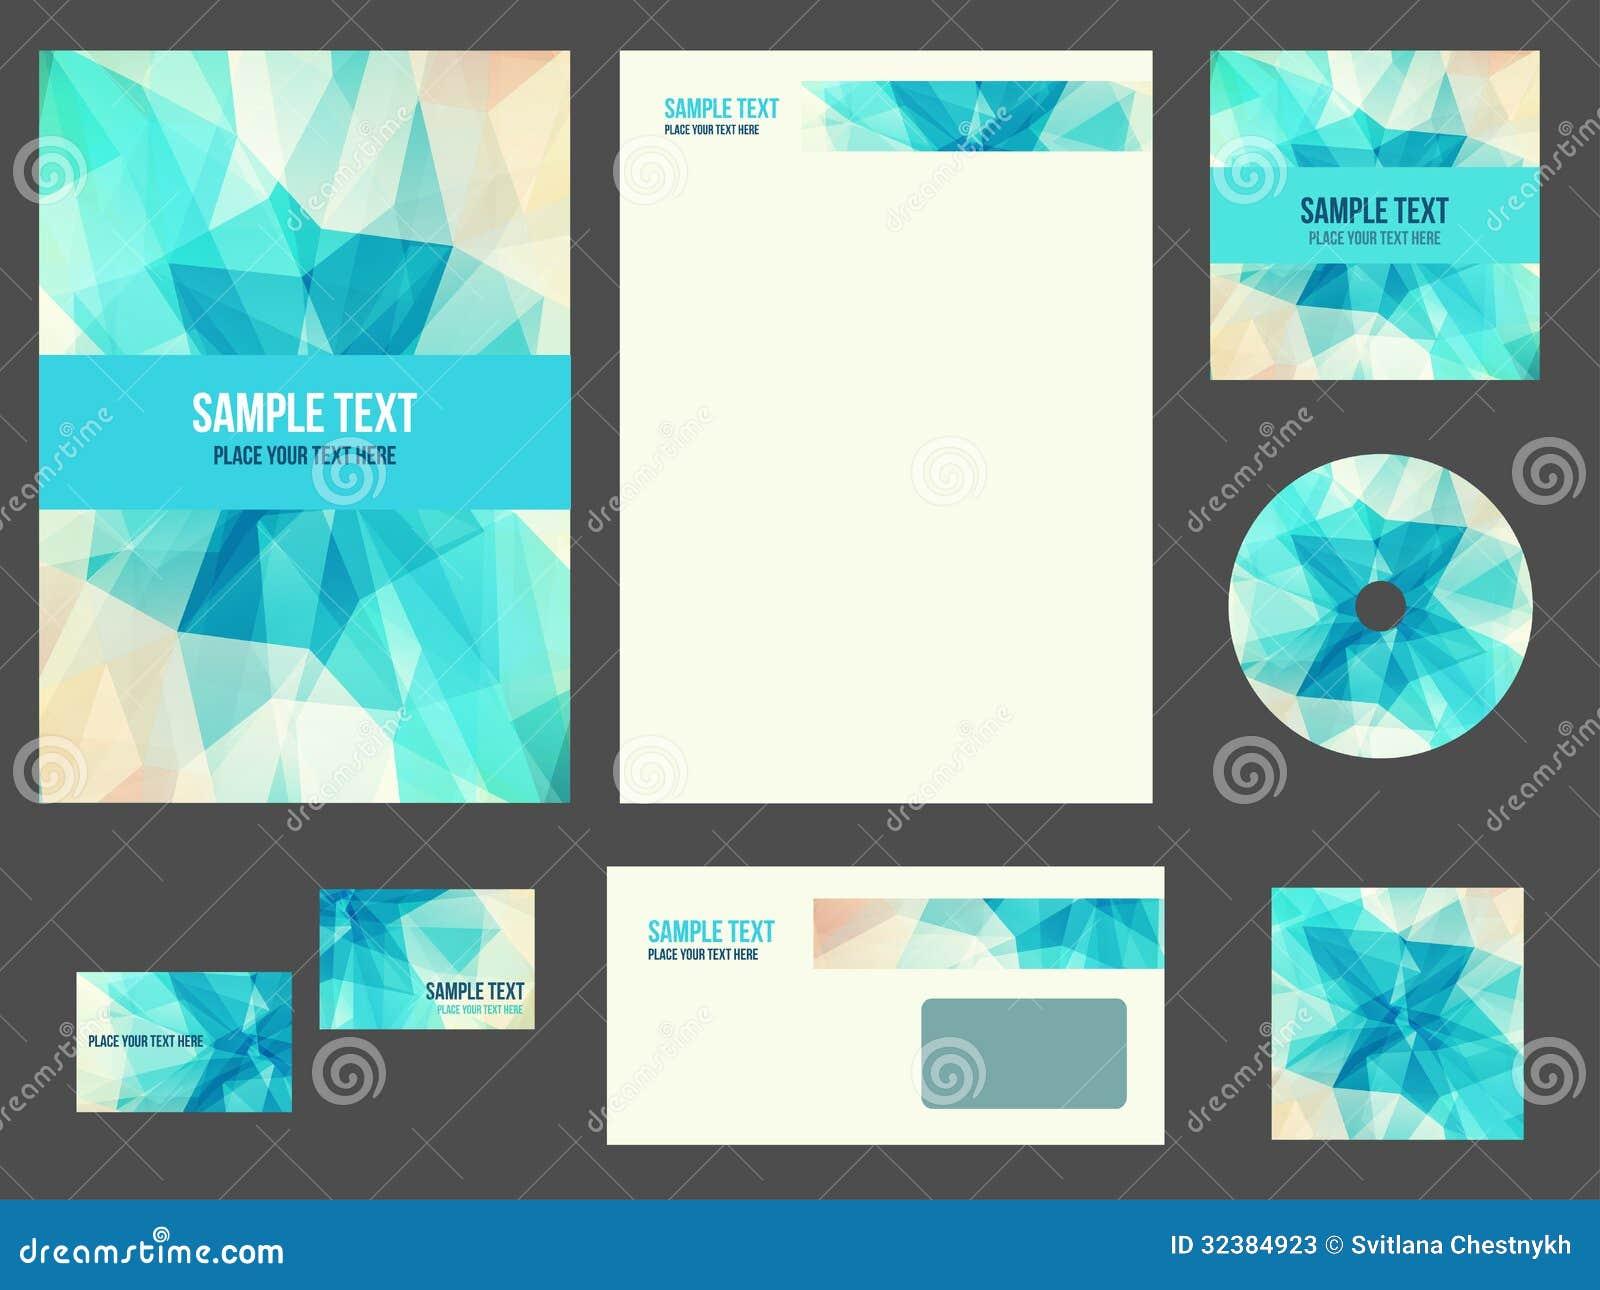 Event Page Design Ideas